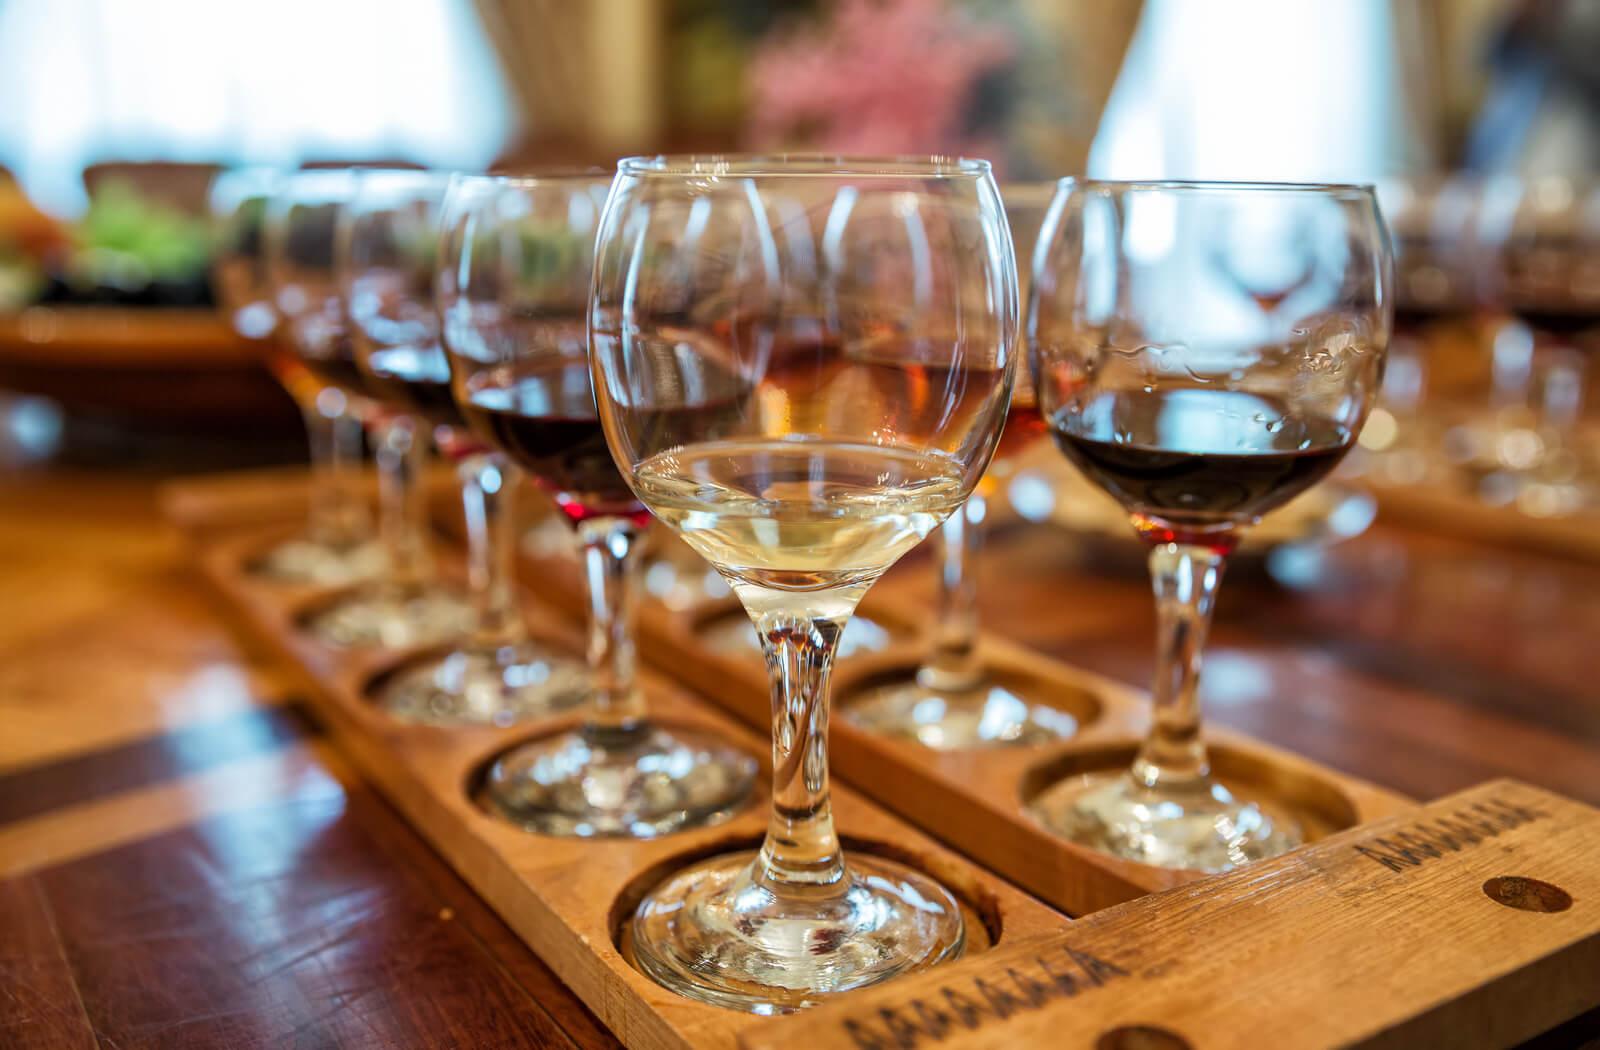 Scouf dégustation de vin à Waterloo